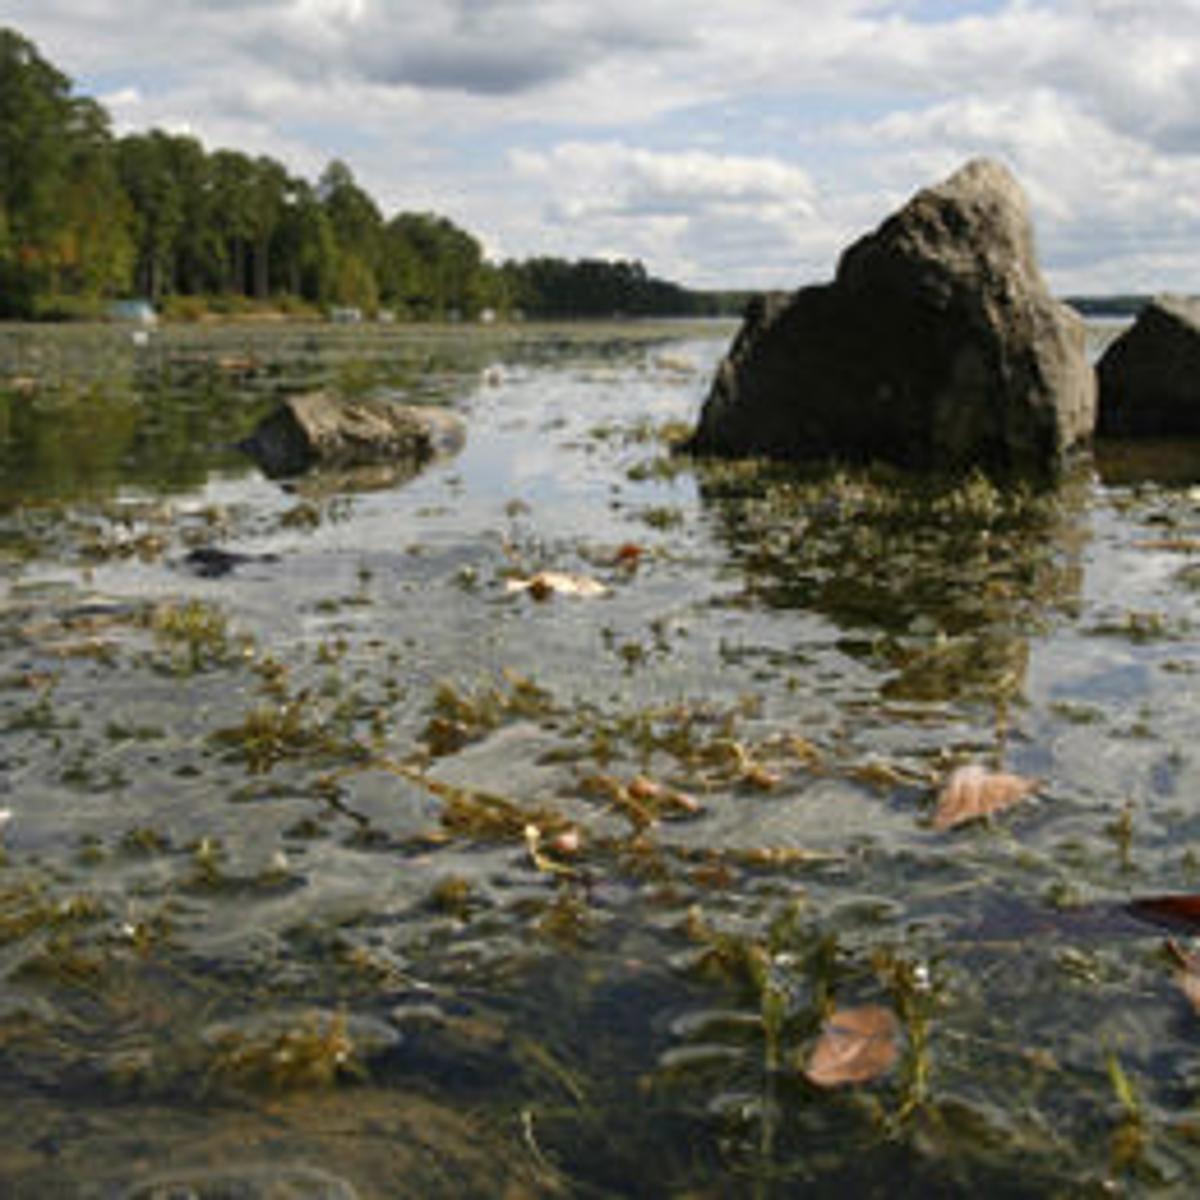 Super Hydrilla problem growing in Chesterfield's Swift Creek Reservoir BO-64